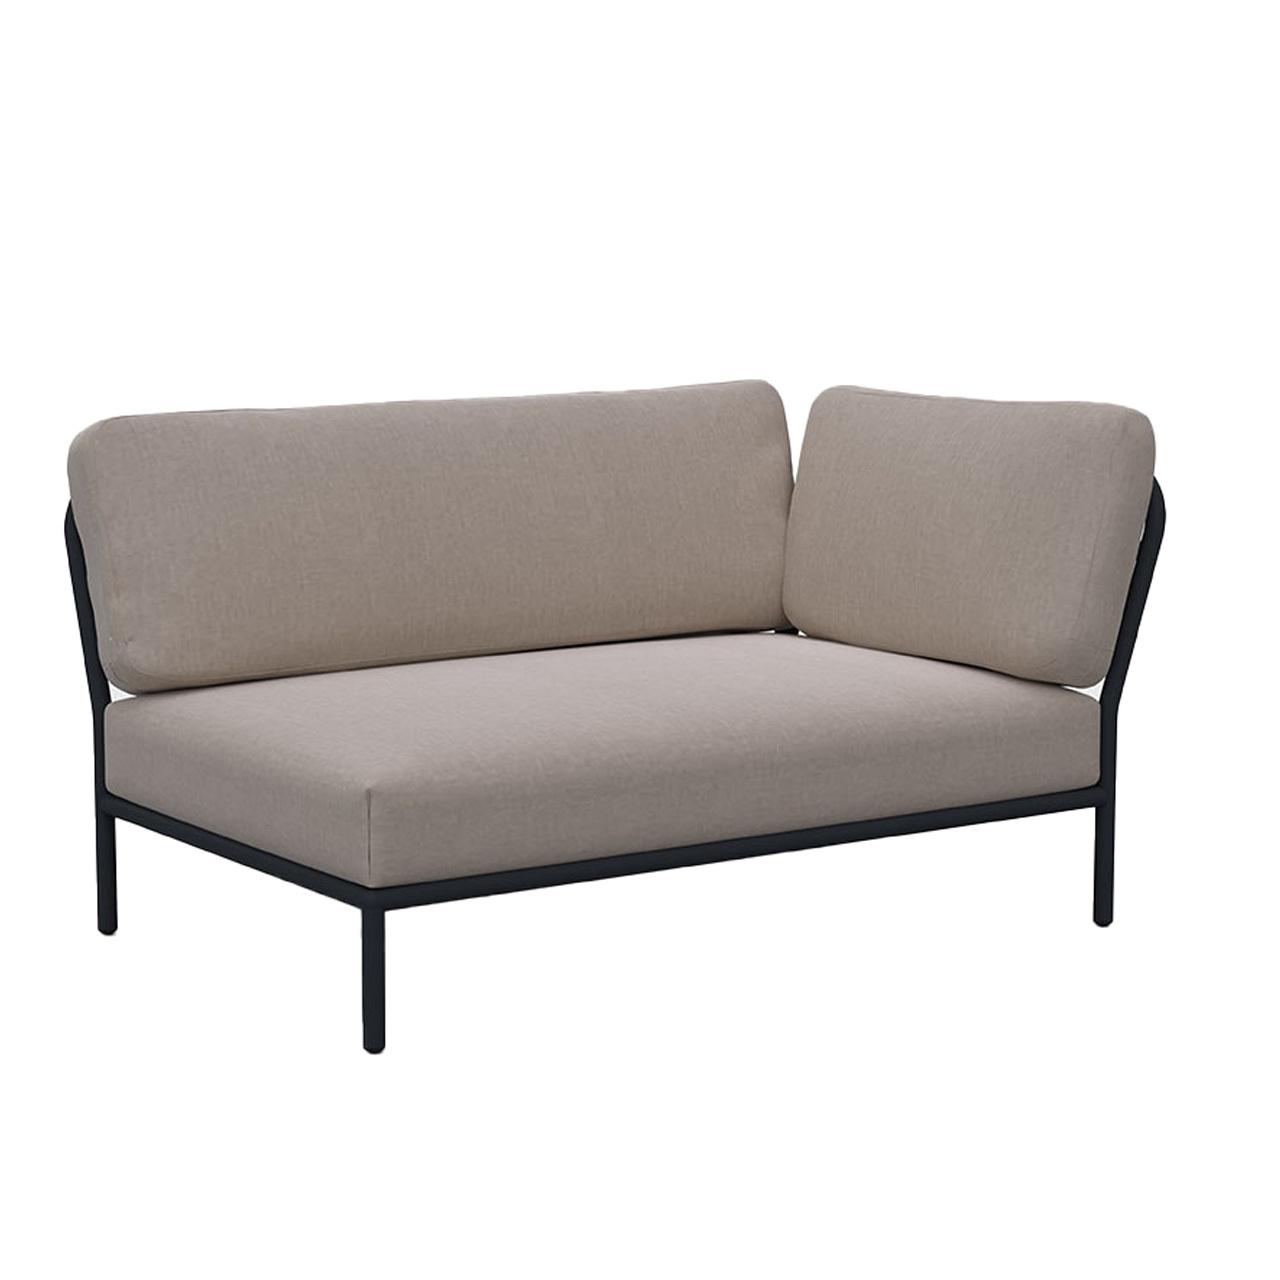 Sofa Level Houe